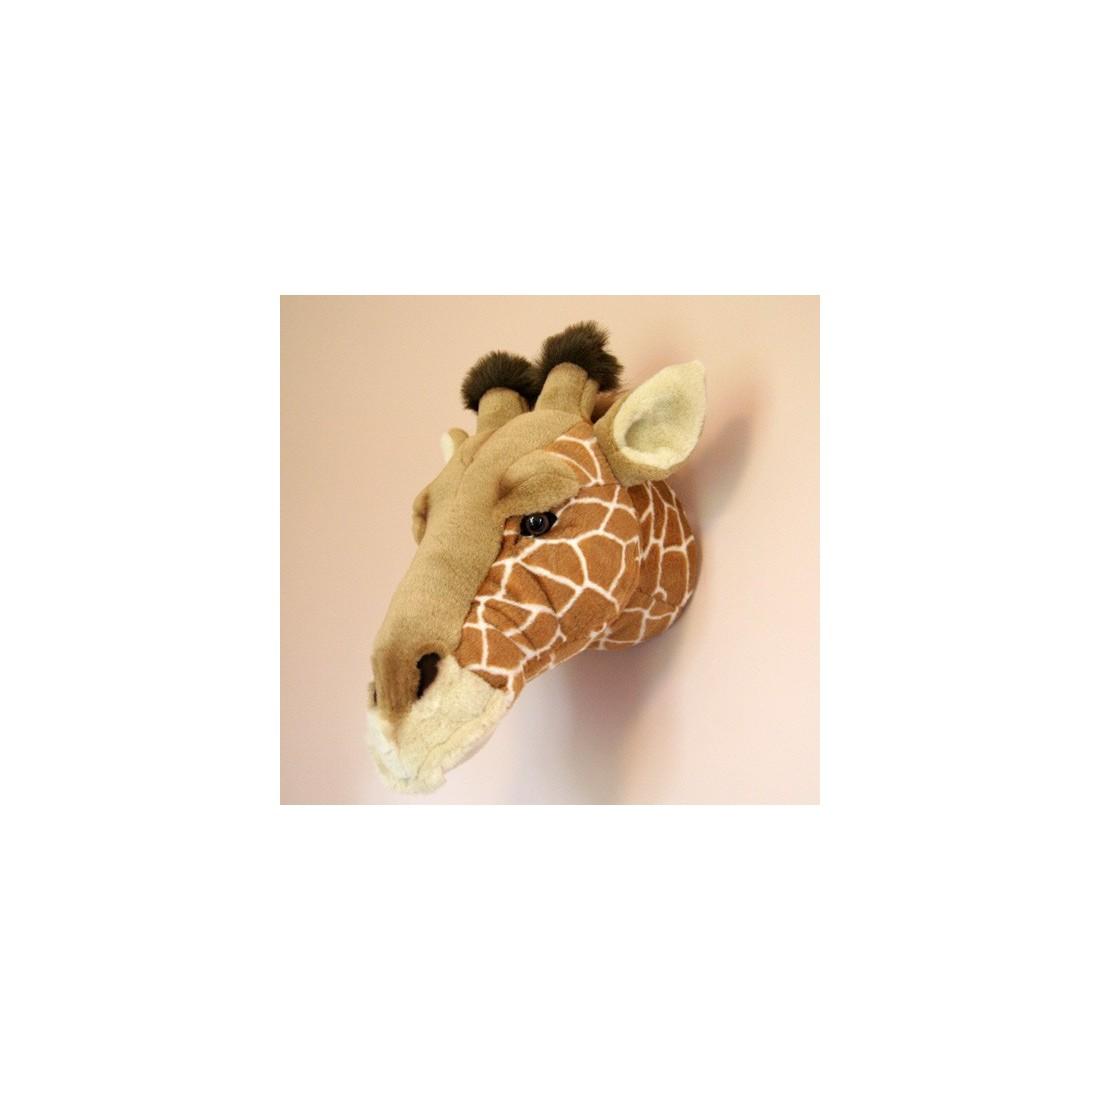 D co murale enfant peluche t te de girafe bibib ma chambramoi - Deco murale enfant ...